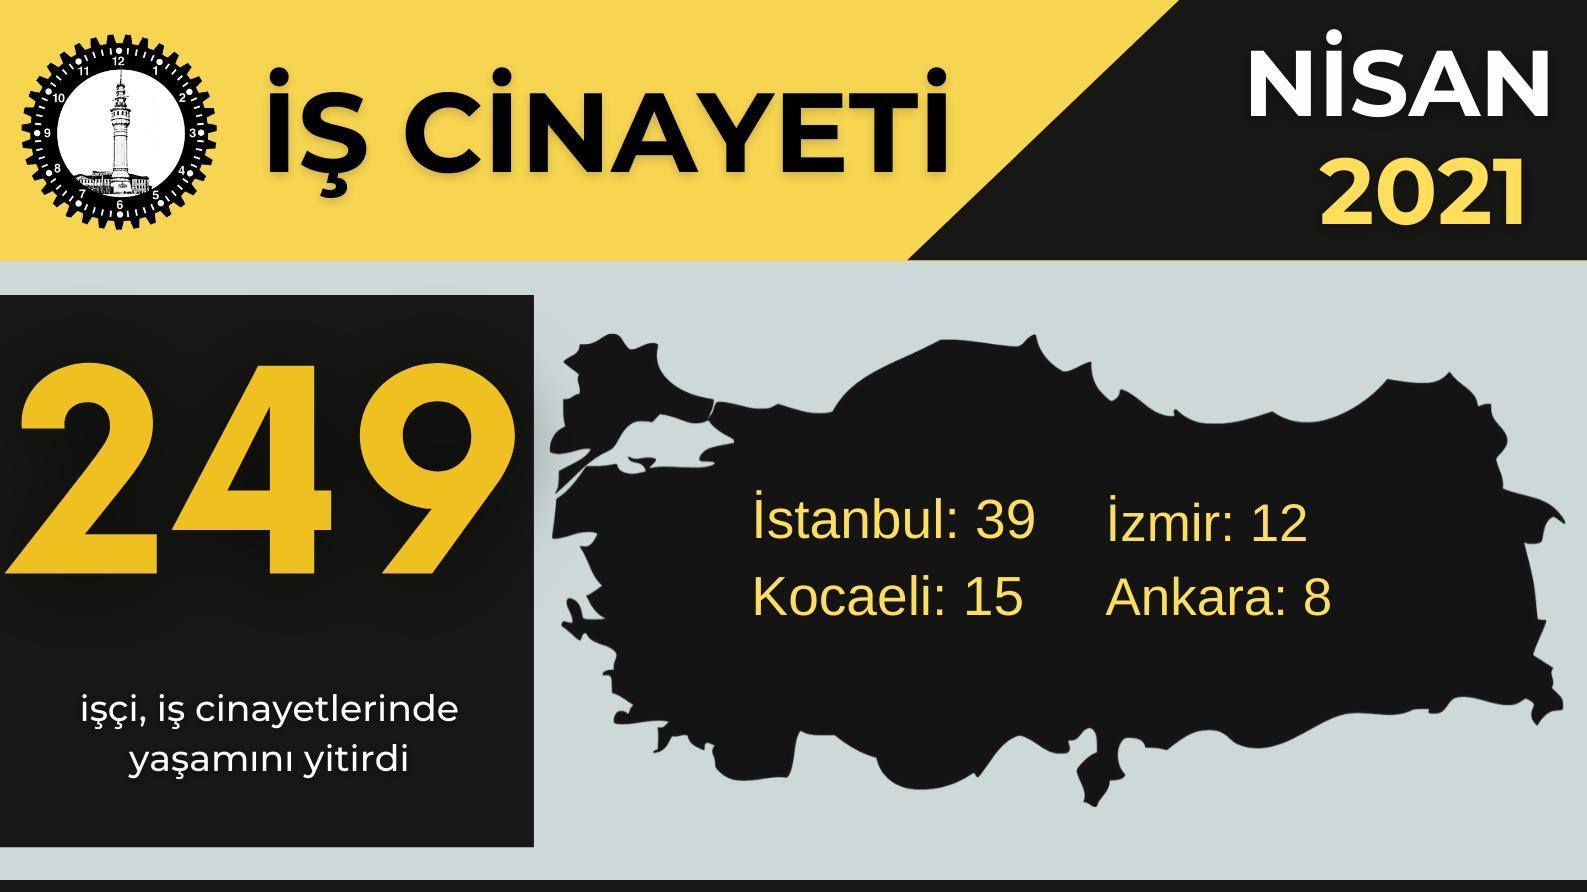 İSİG Nisan raporu: 249 iş cinayeti